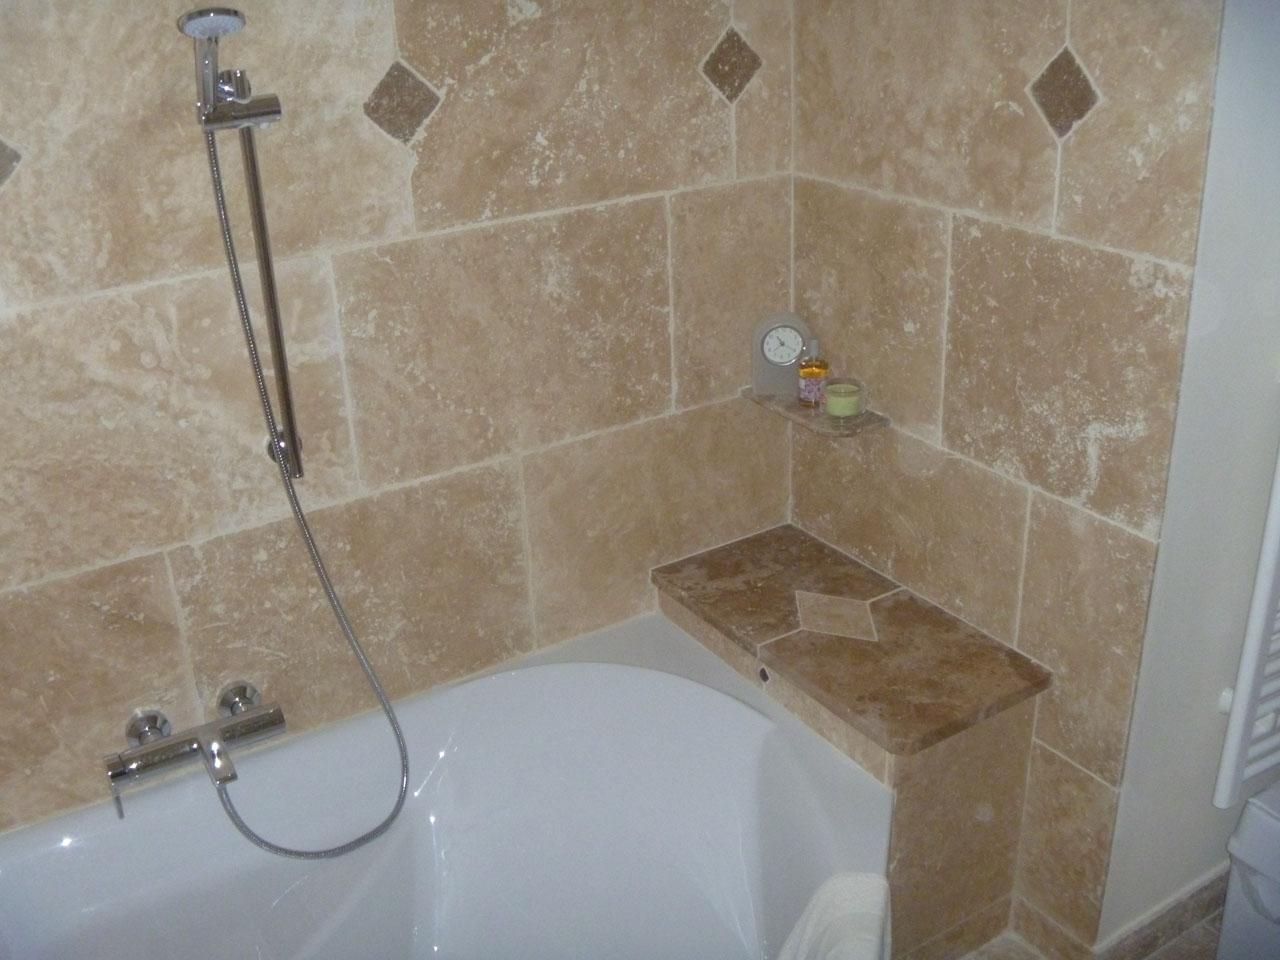 Pose carrelage salle de bain baignoire suite des travaux for Pose carrelage salle de bain baignoire